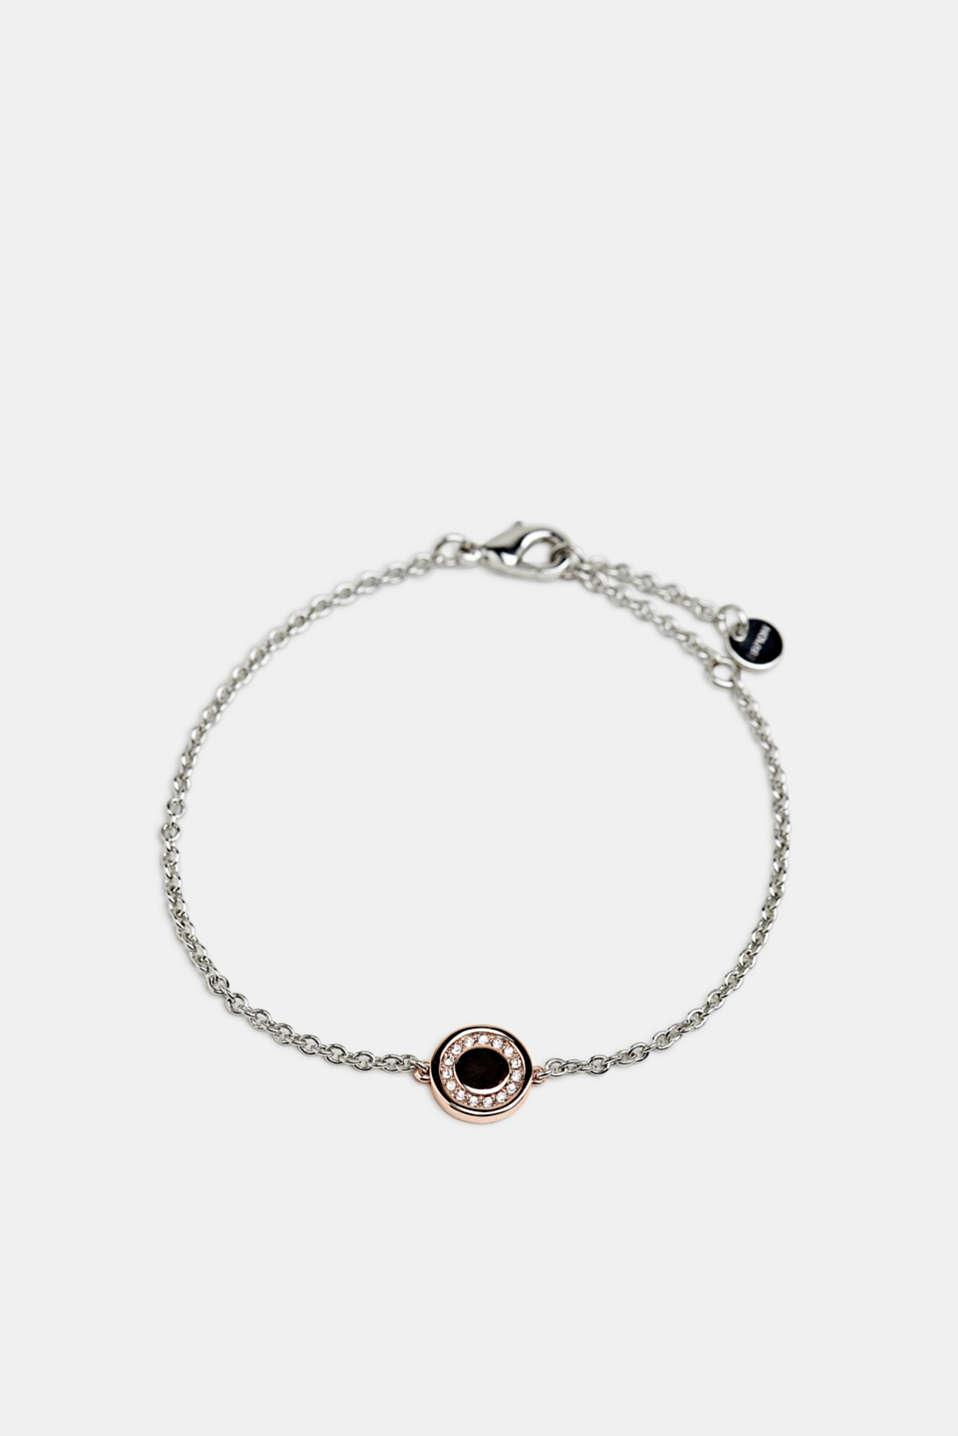 Watch and bracelet set, LCBLUE, detail image number 3